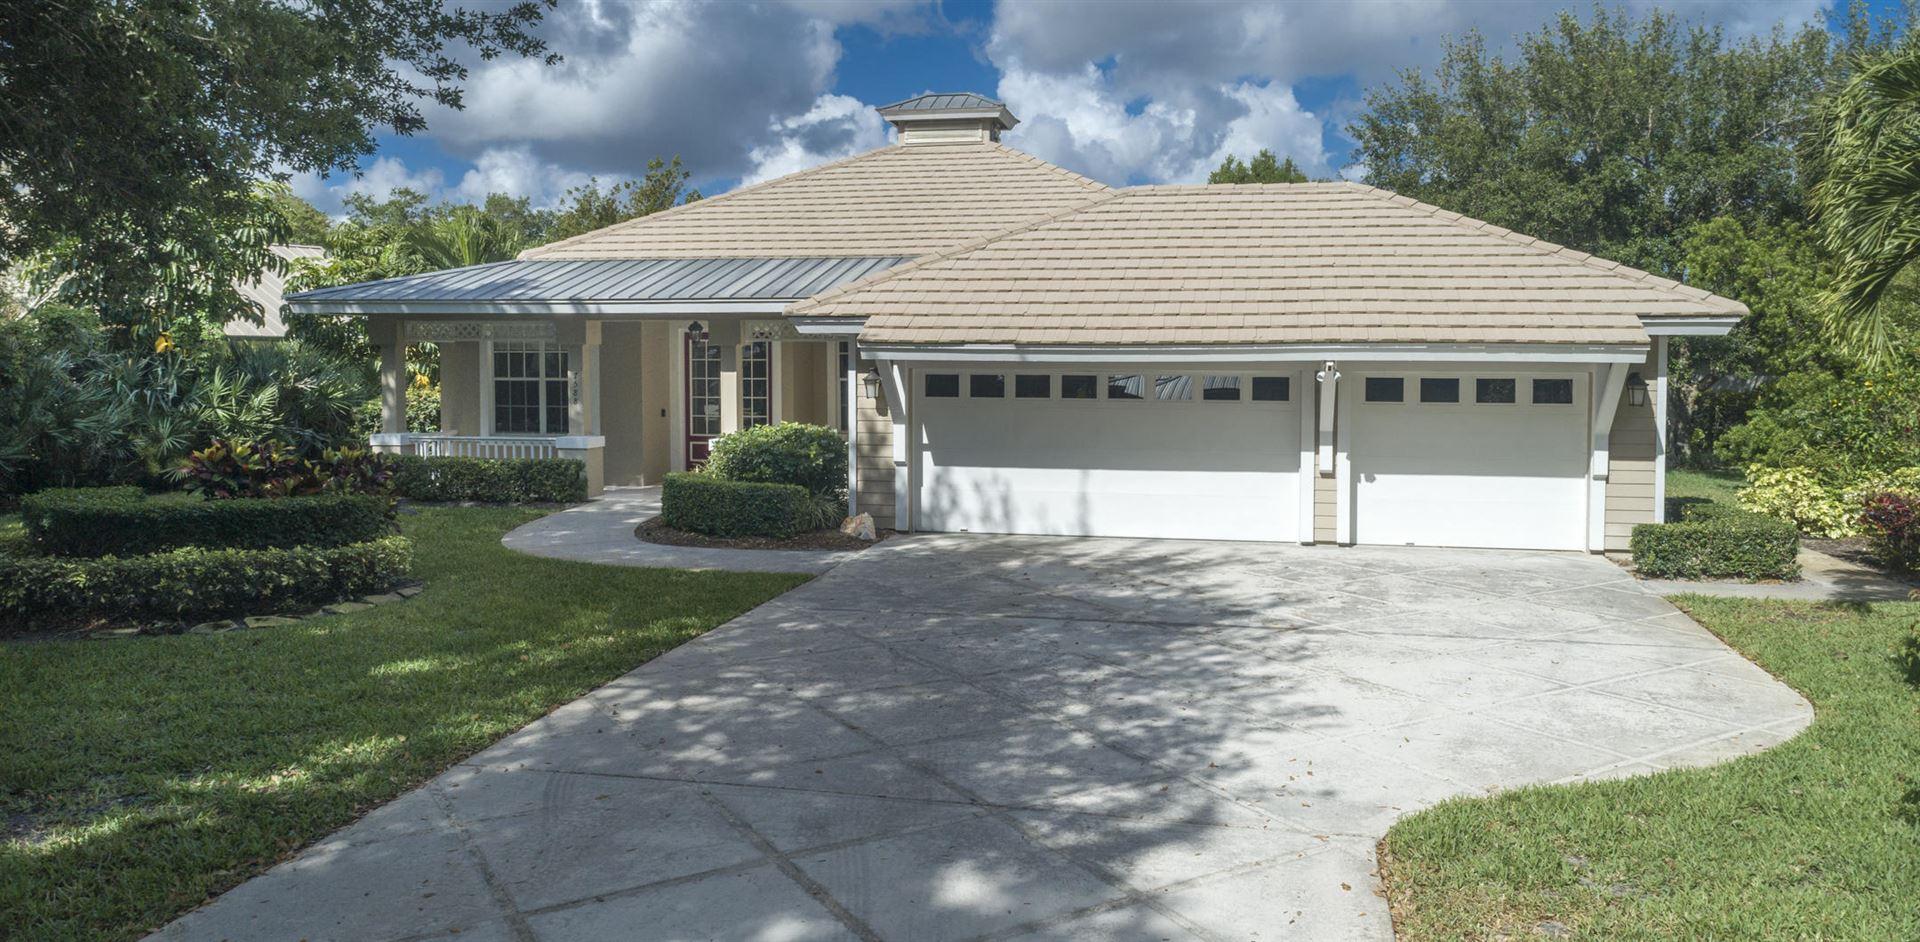 7588 SE Teton Drive, Hobe Sound, FL 33455 - #: RX-10704161